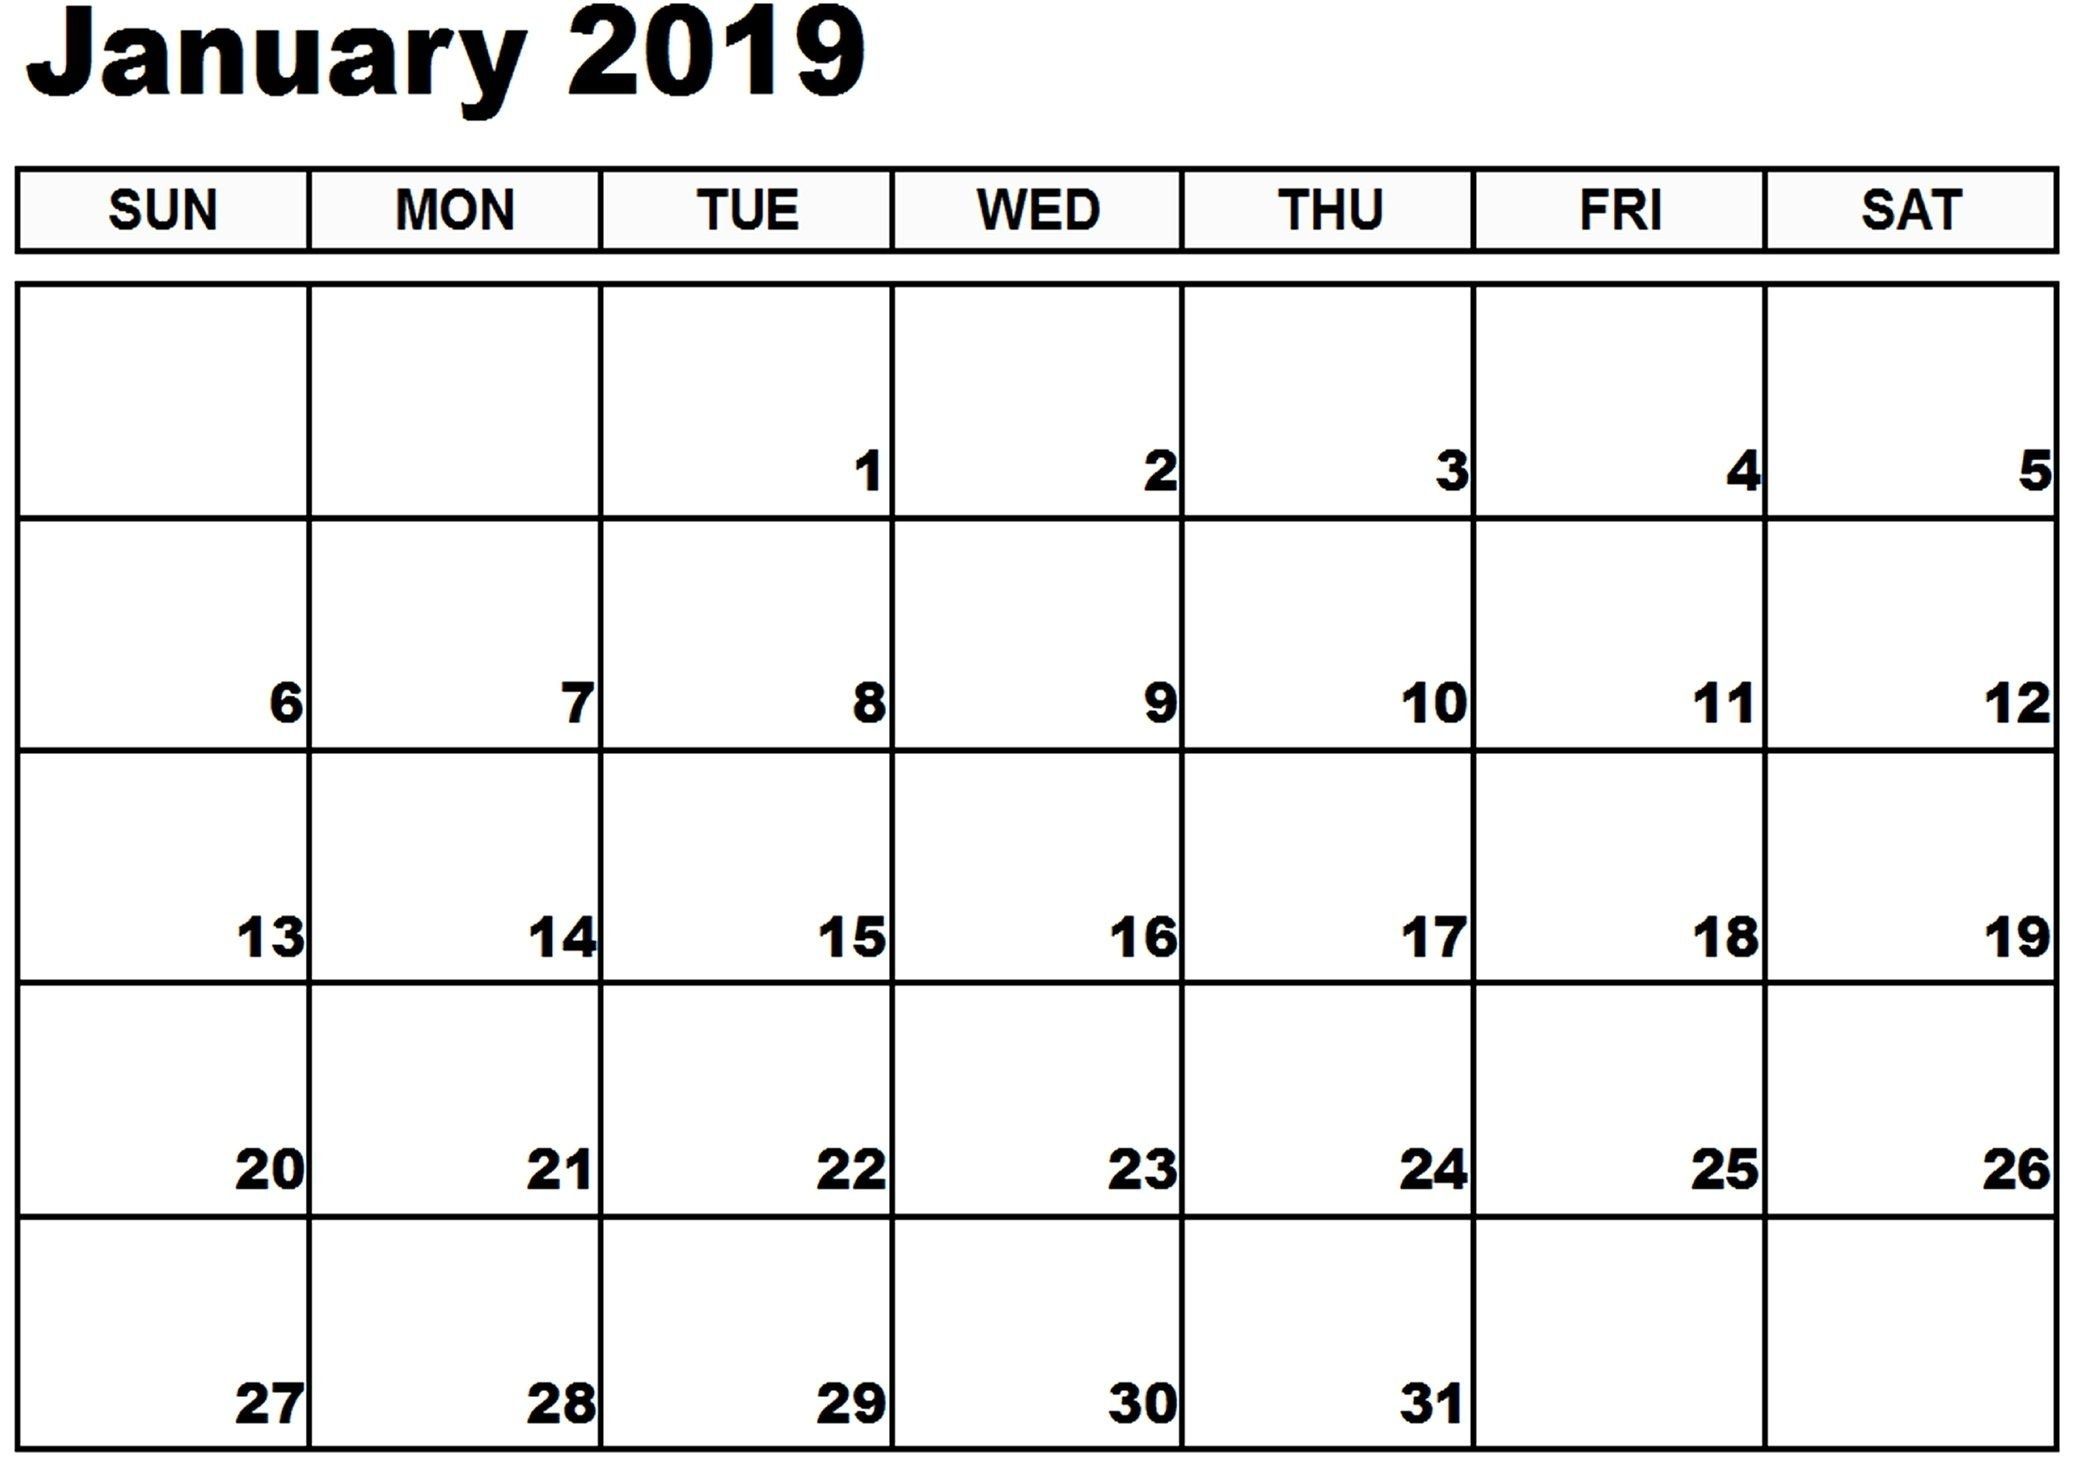 January 2019 Calendar Xls #printable #calendar #calendar2019 Calendar 2019 Xls